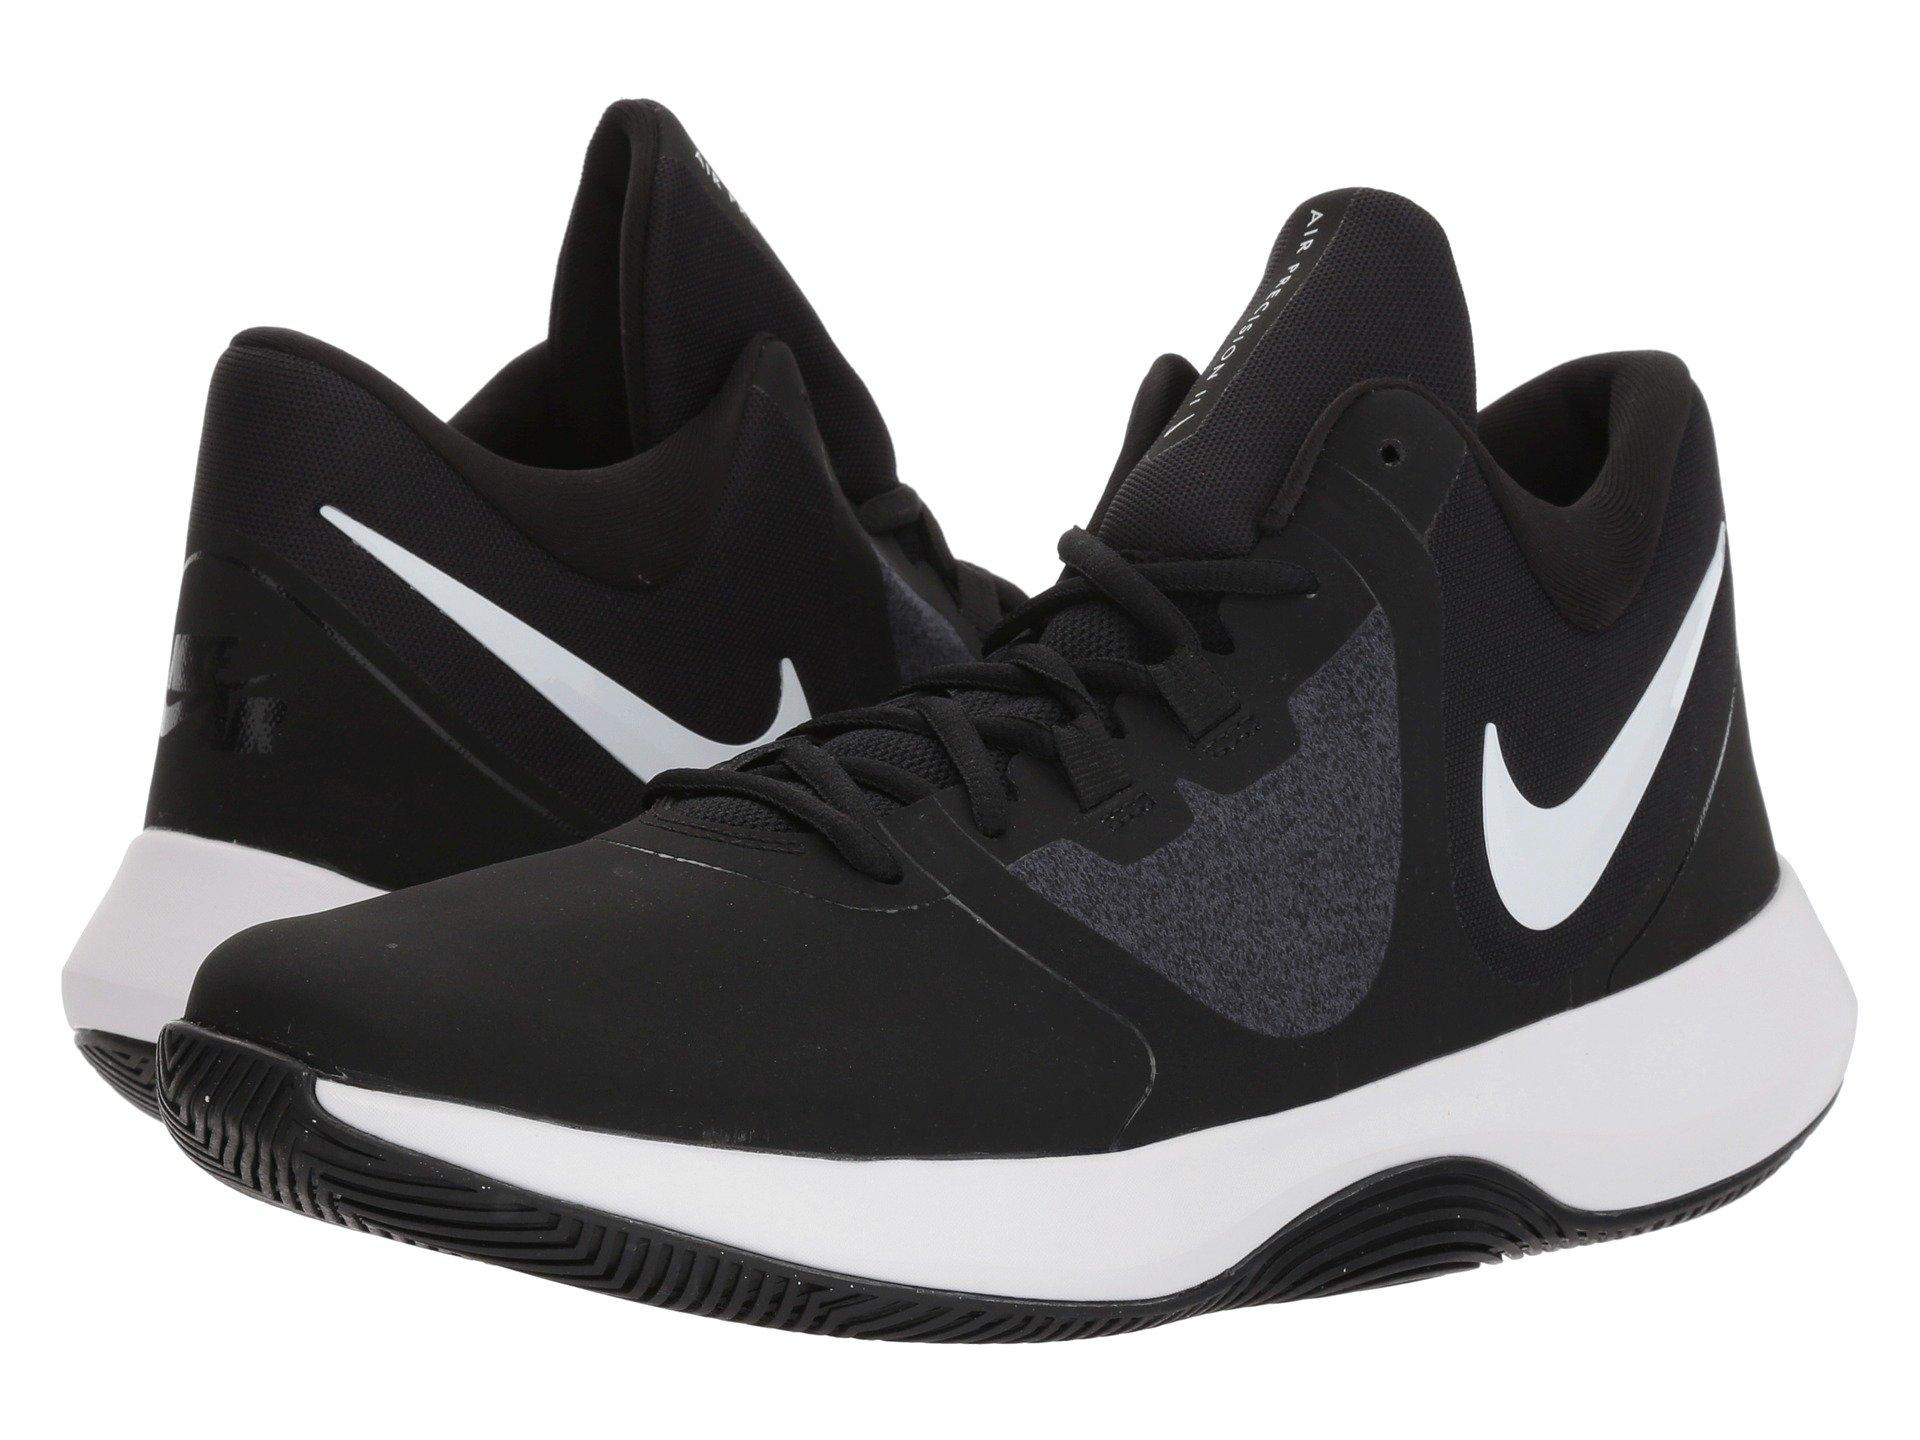 brand new 7cf82 5ce29 Tumblr Nike Schuhe Jungen Huarache Outlet x0PqYIZS